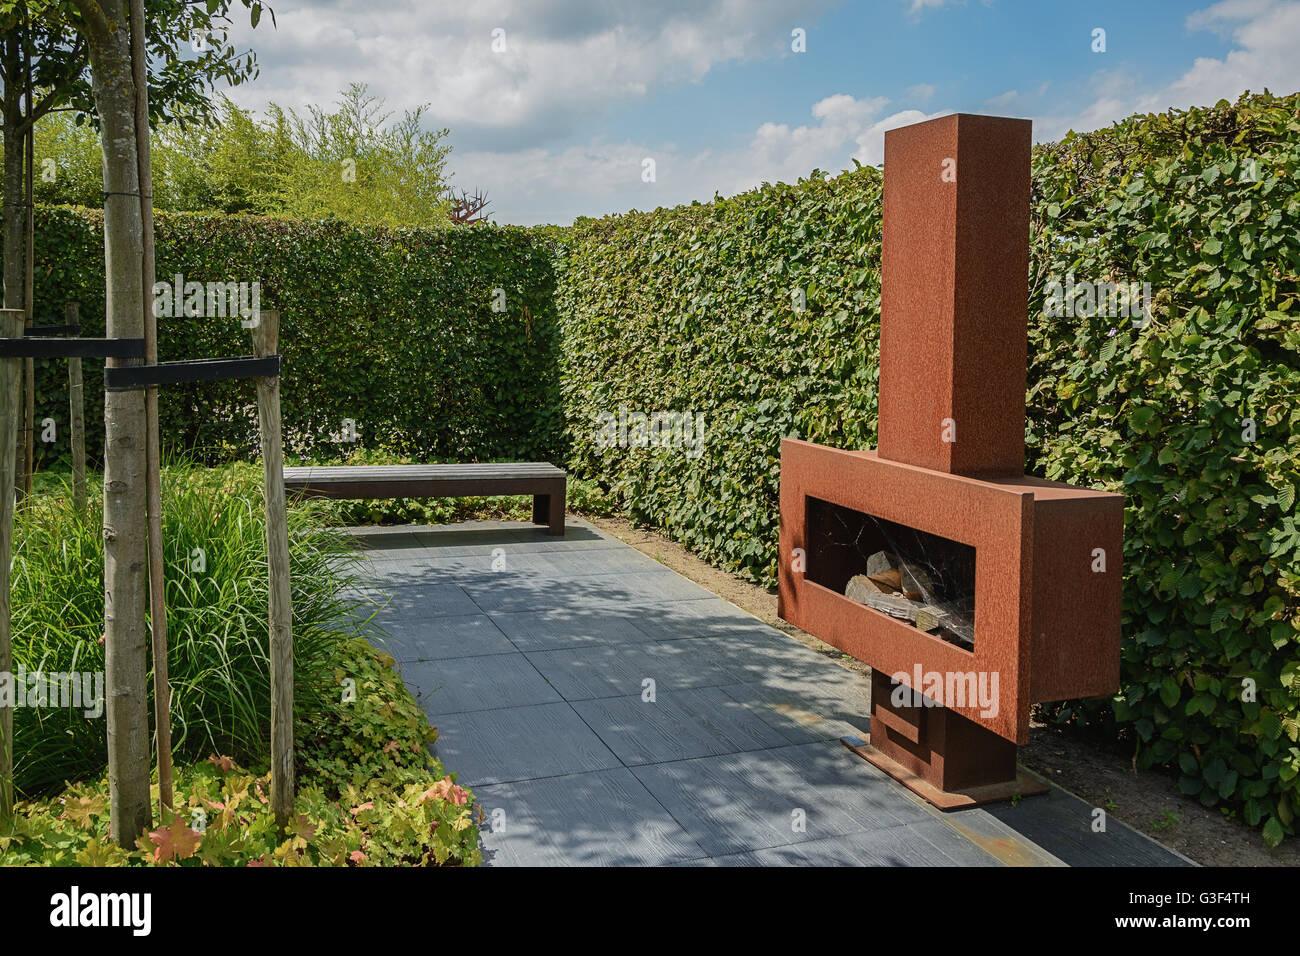 Modern Garden Design Stockfotos & Modern Garden Design Bilder - Alamy